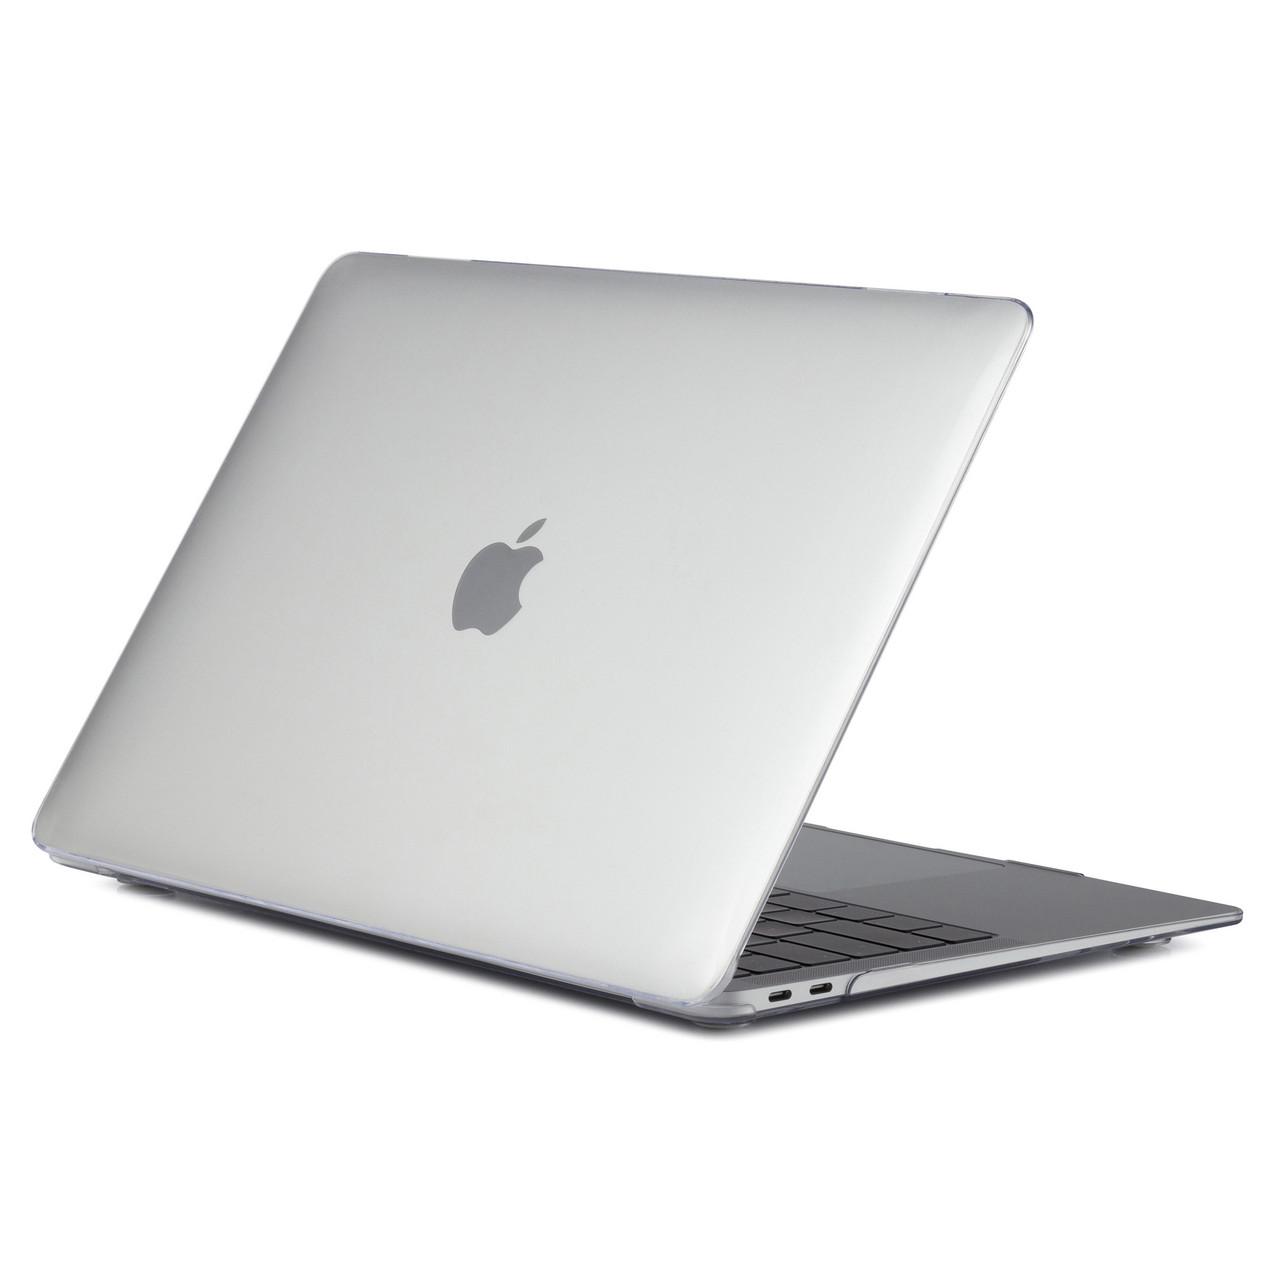 "Чохол пластикова накладка для макбук Apple Macbook Air M1 2020-2021 13,3"" (А2337) - прозора"